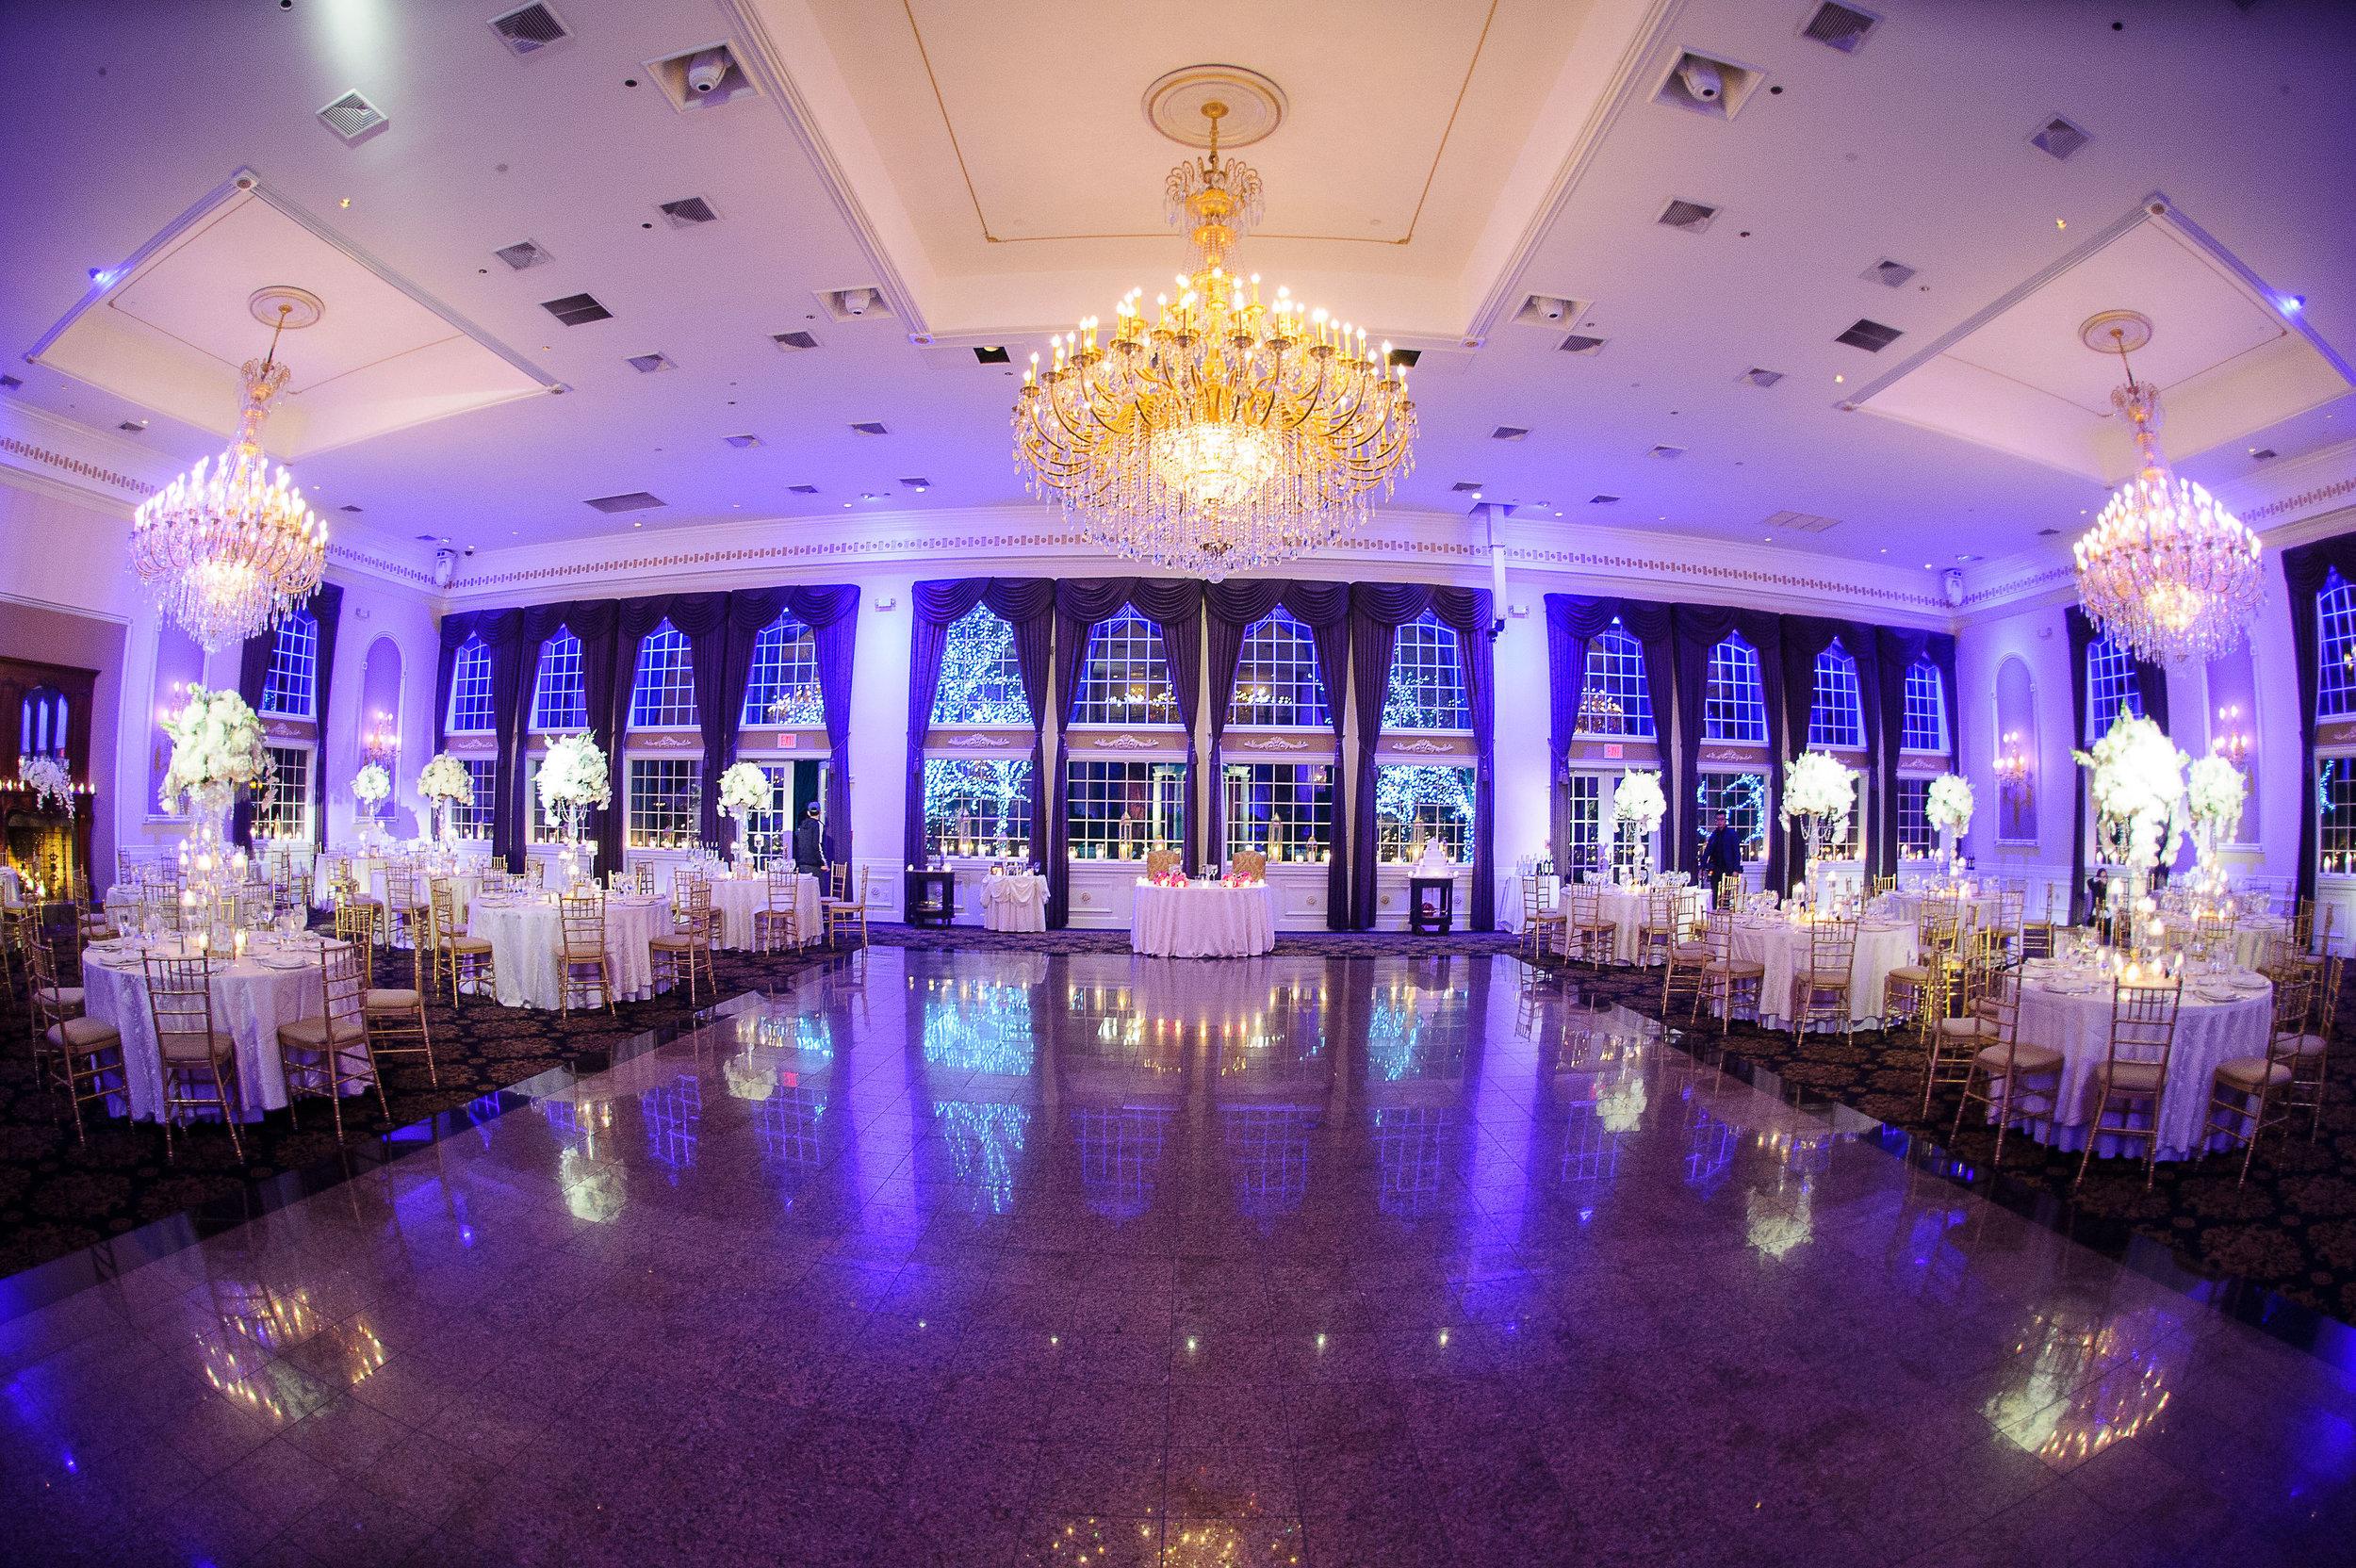 Ceci_New_York_Custom_Invitation_ New_Jersey_Wedding_Luxury_Personalized_Ceci_Style_Bride_Foil_Stamping114.JPG